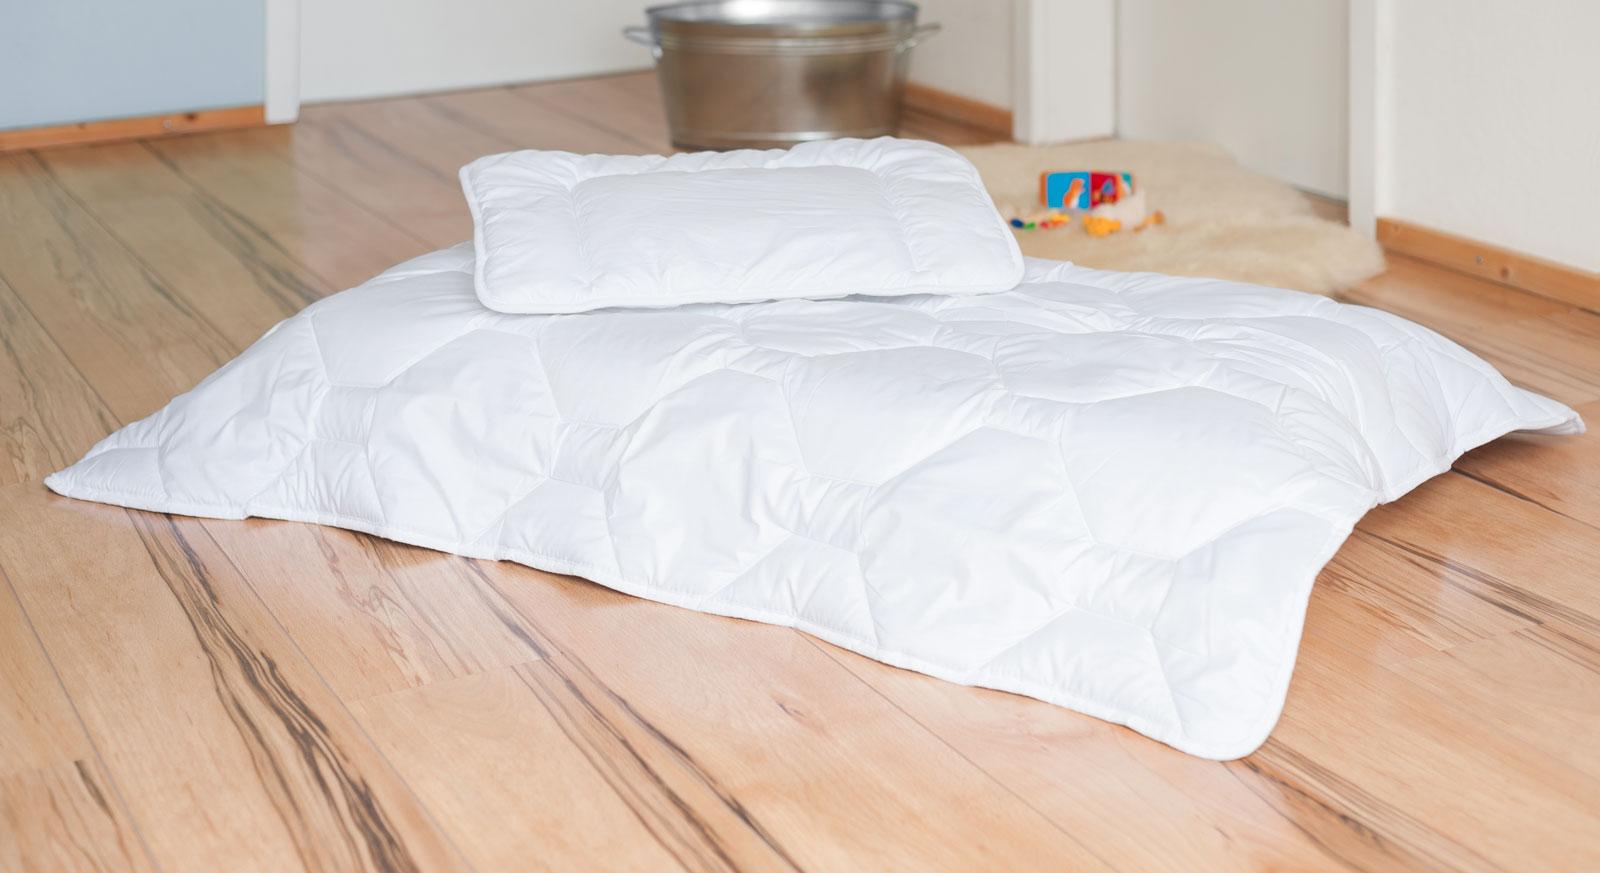 warme kinderbettdecke und 40x60 cm gro es kissen linus winter. Black Bedroom Furniture Sets. Home Design Ideas